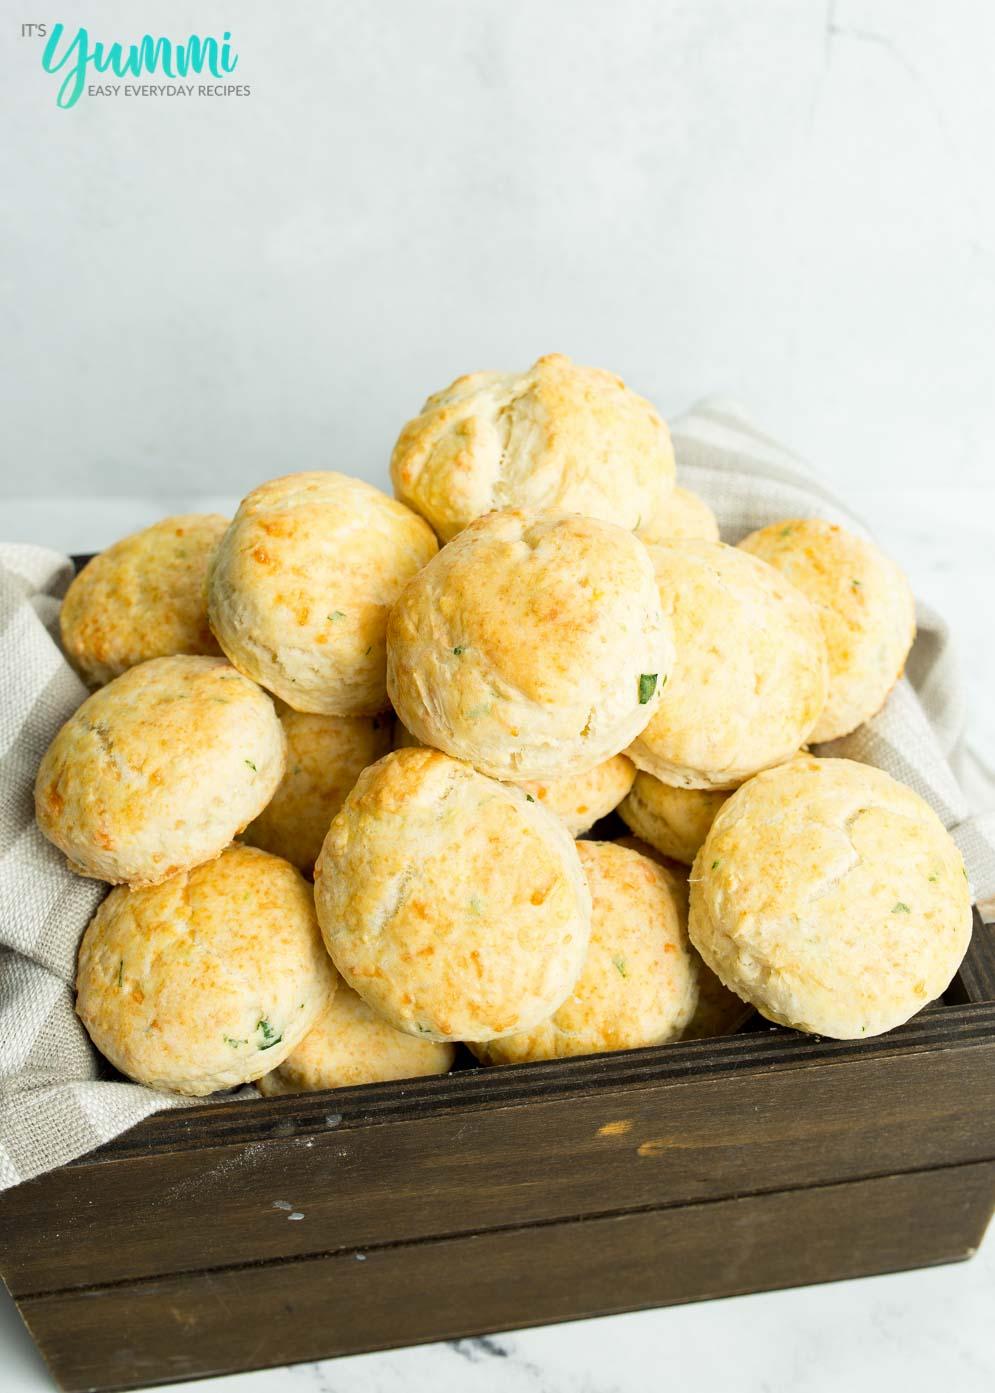 Baked Cheddar Bay Biscuits in wooden basket